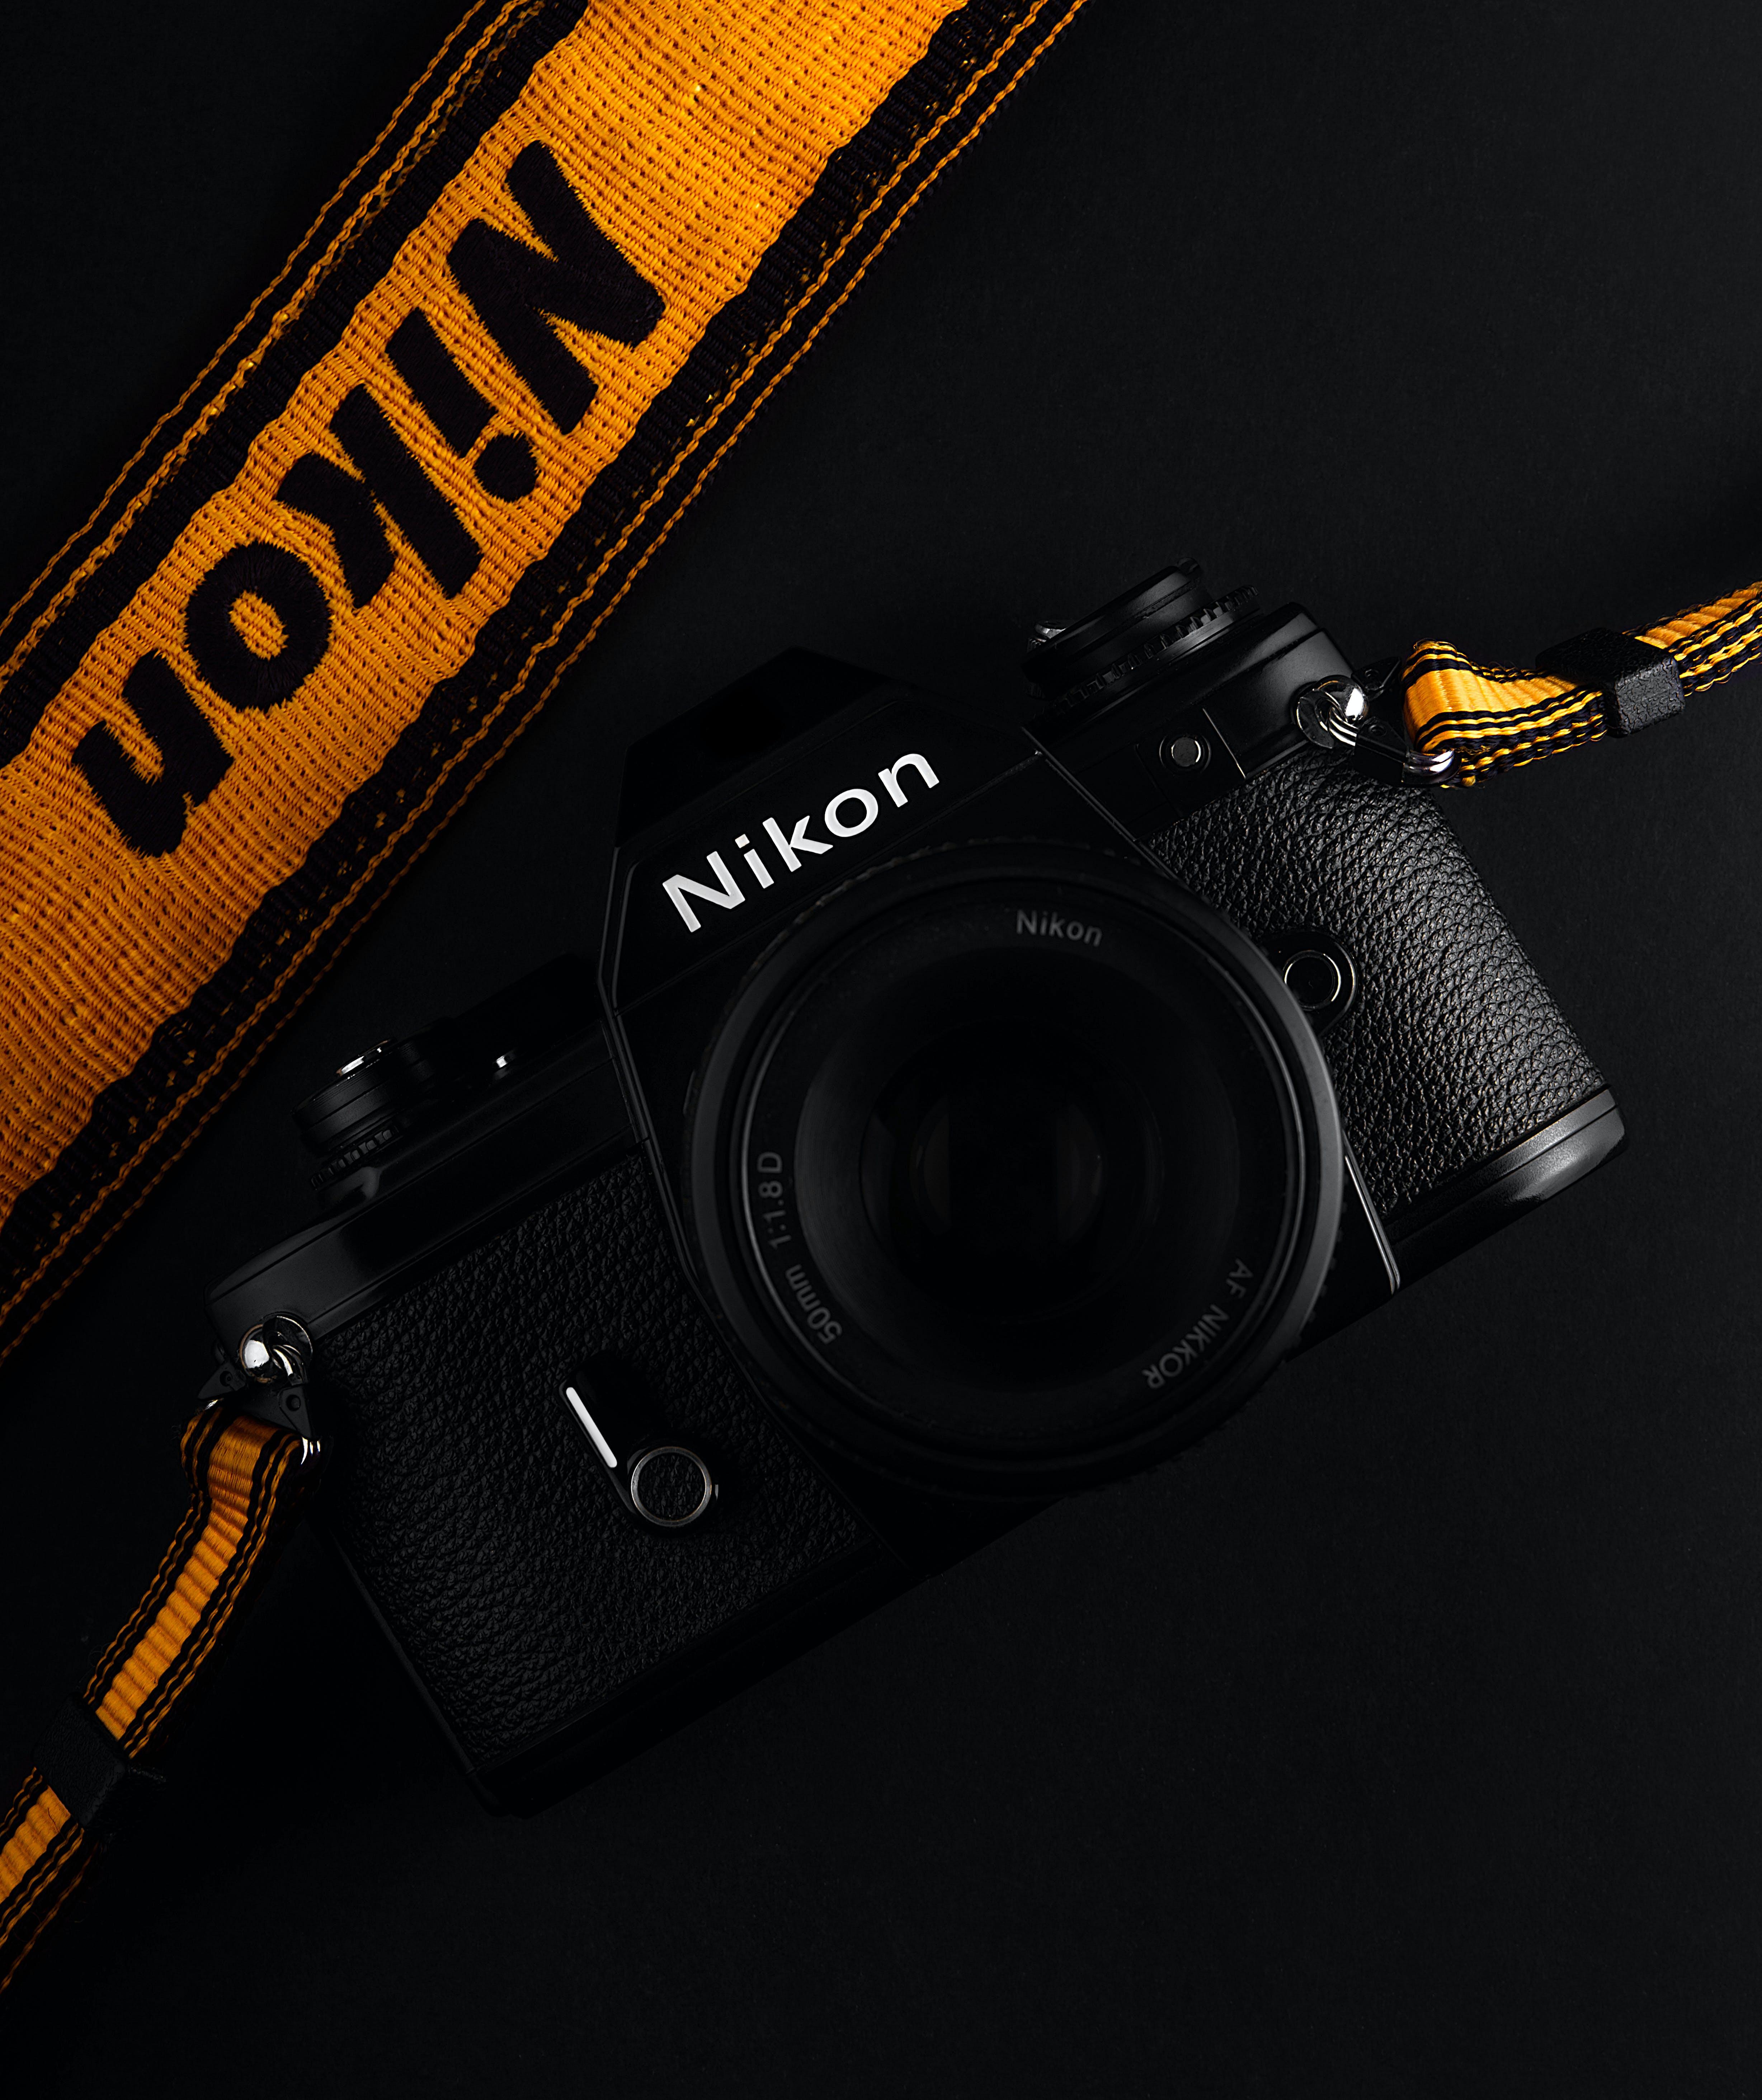 Foto stok gratis 35mm, kamera, kunci rendah, nikon